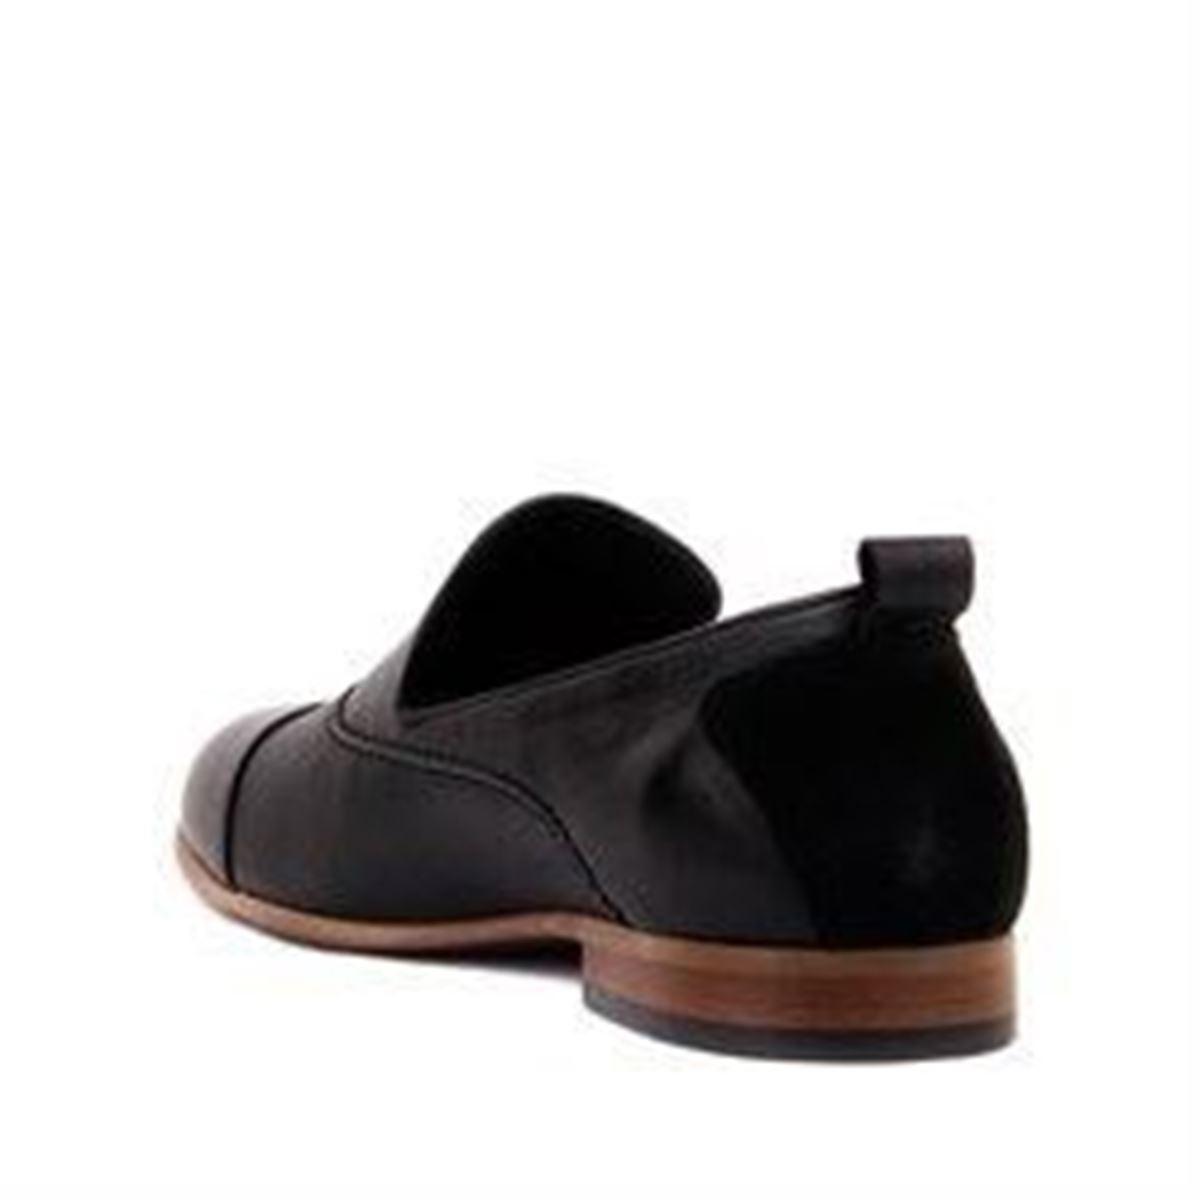 صورة Sail Lakers - Siyah Deri Erkek Günlük Ayakkabı